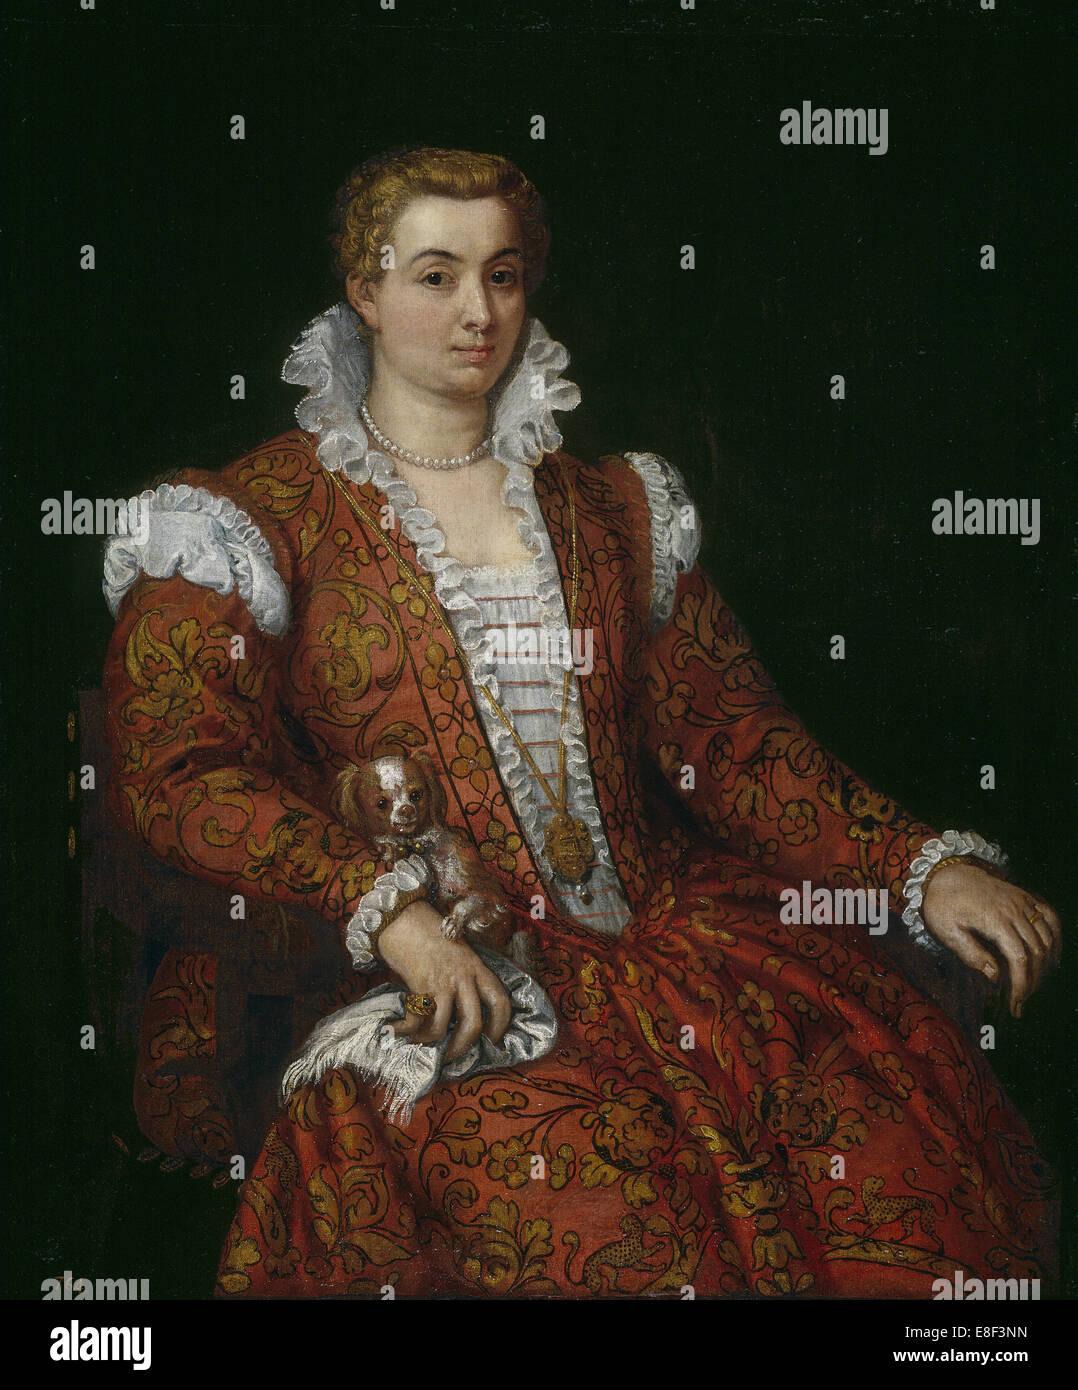 Livia Colonna. Künstler: Veronese, Paolo (1528-1588) Stockbild